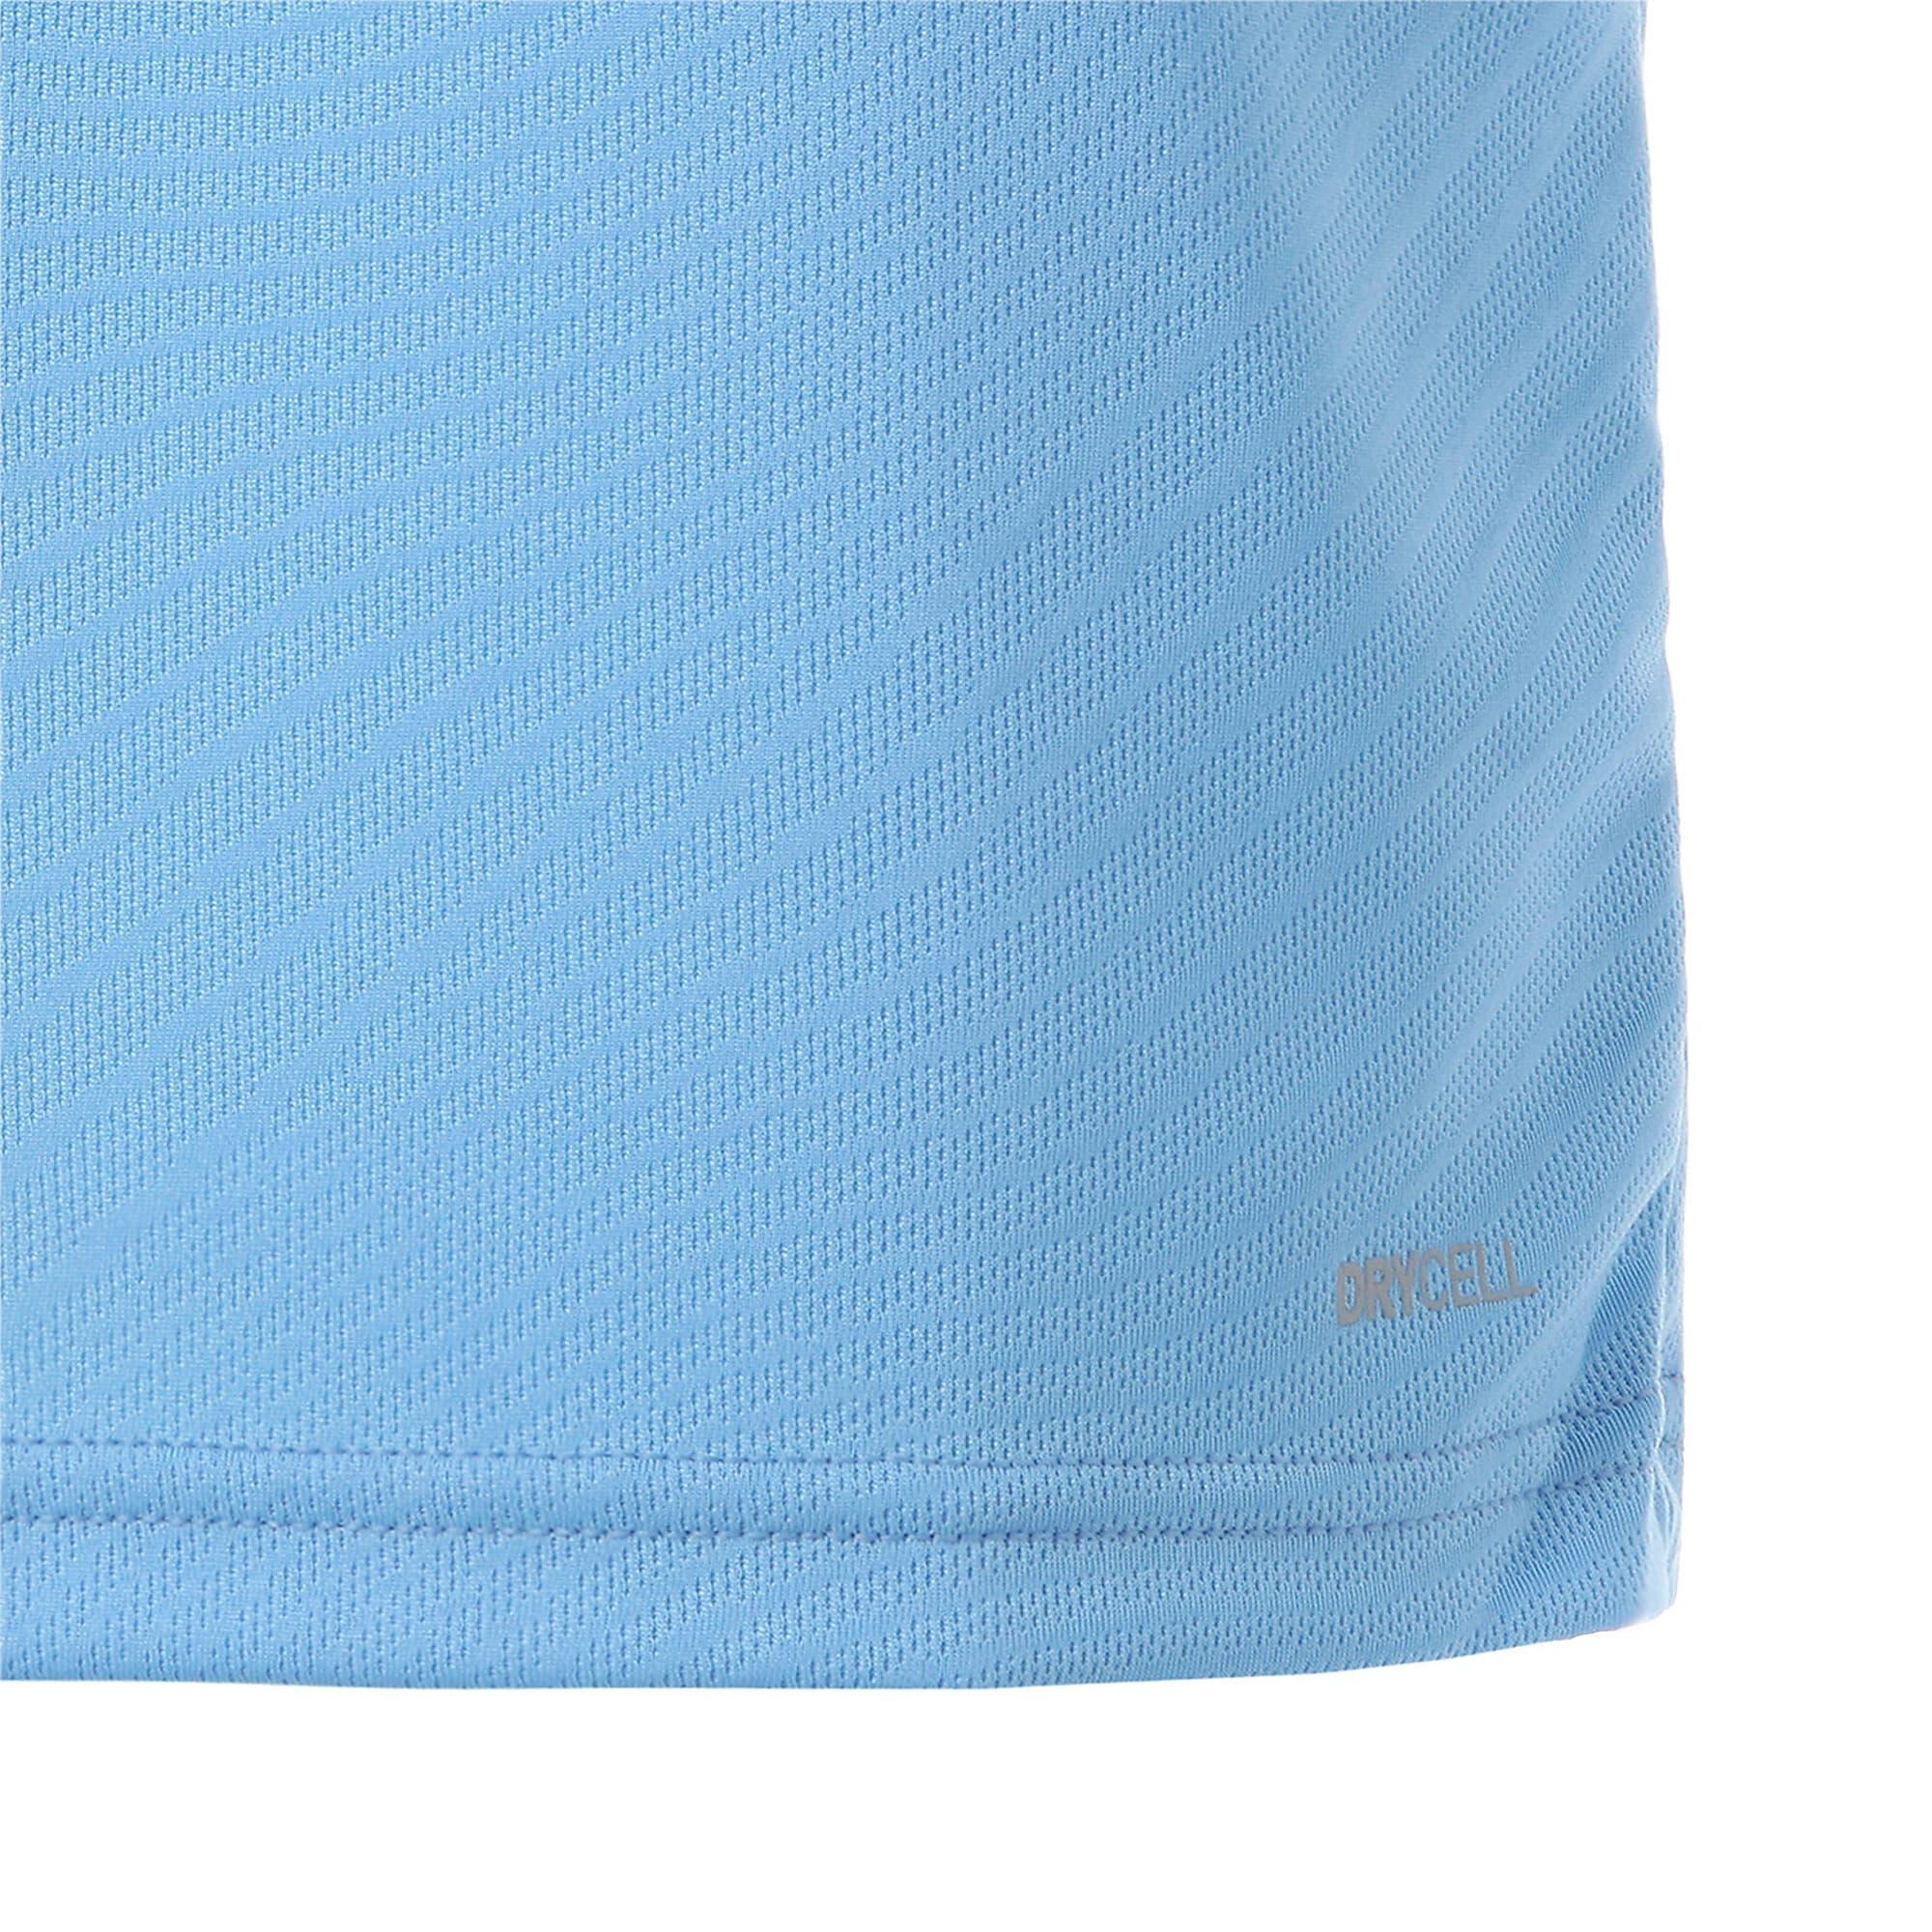 Thumbnail 6 of マンチェスター・シティ MCFC SS ホーム レプリカシャツ 半袖, TeamLightBlue-TillandsiaPurp, medium-JPN